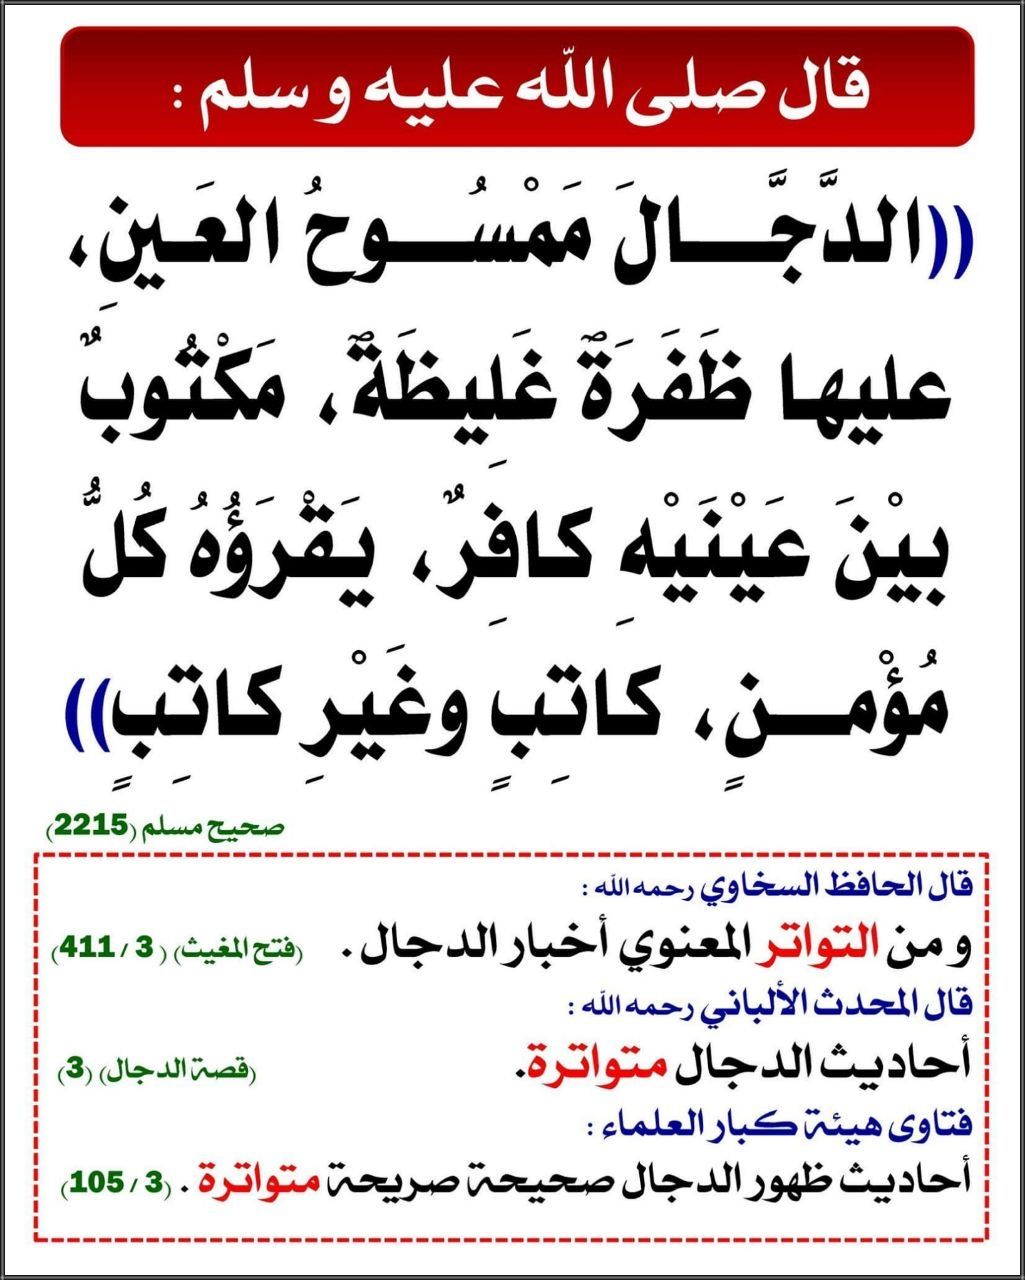 Pin By الأثر الجميل On أحاديث نبوية Islamic Inspirational Quotes Islamic Quotes Hadith